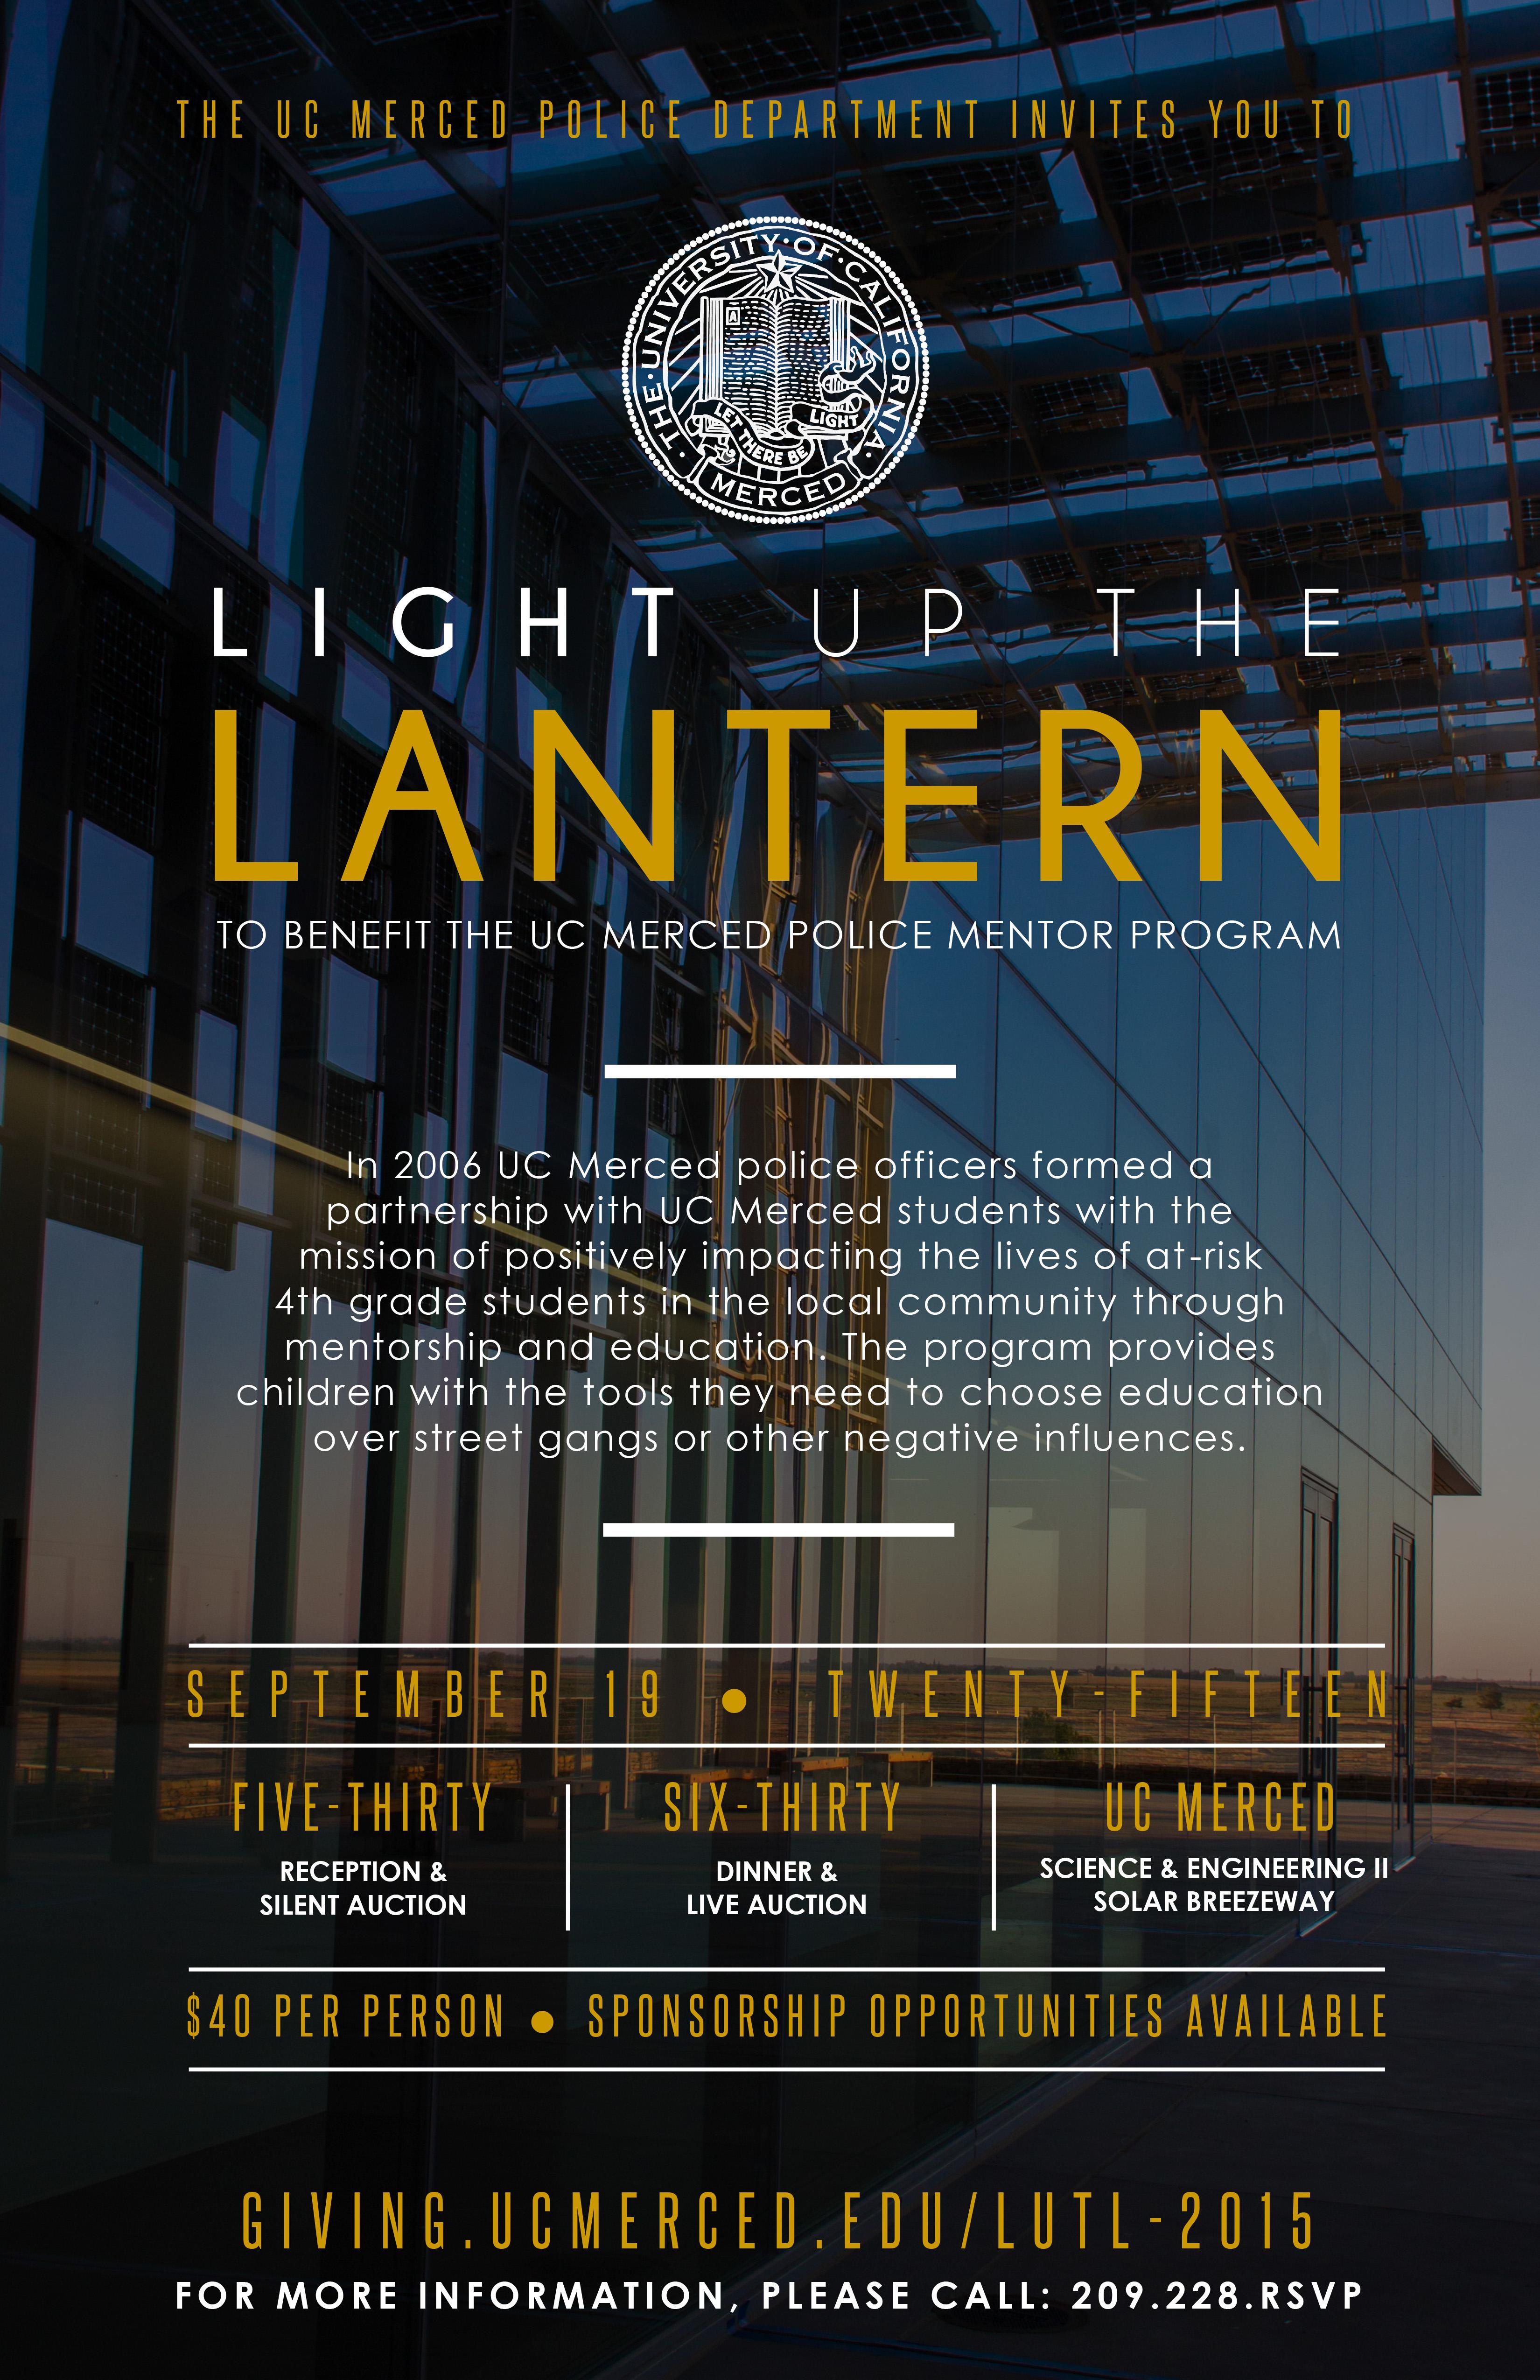 Light Up the Lantern